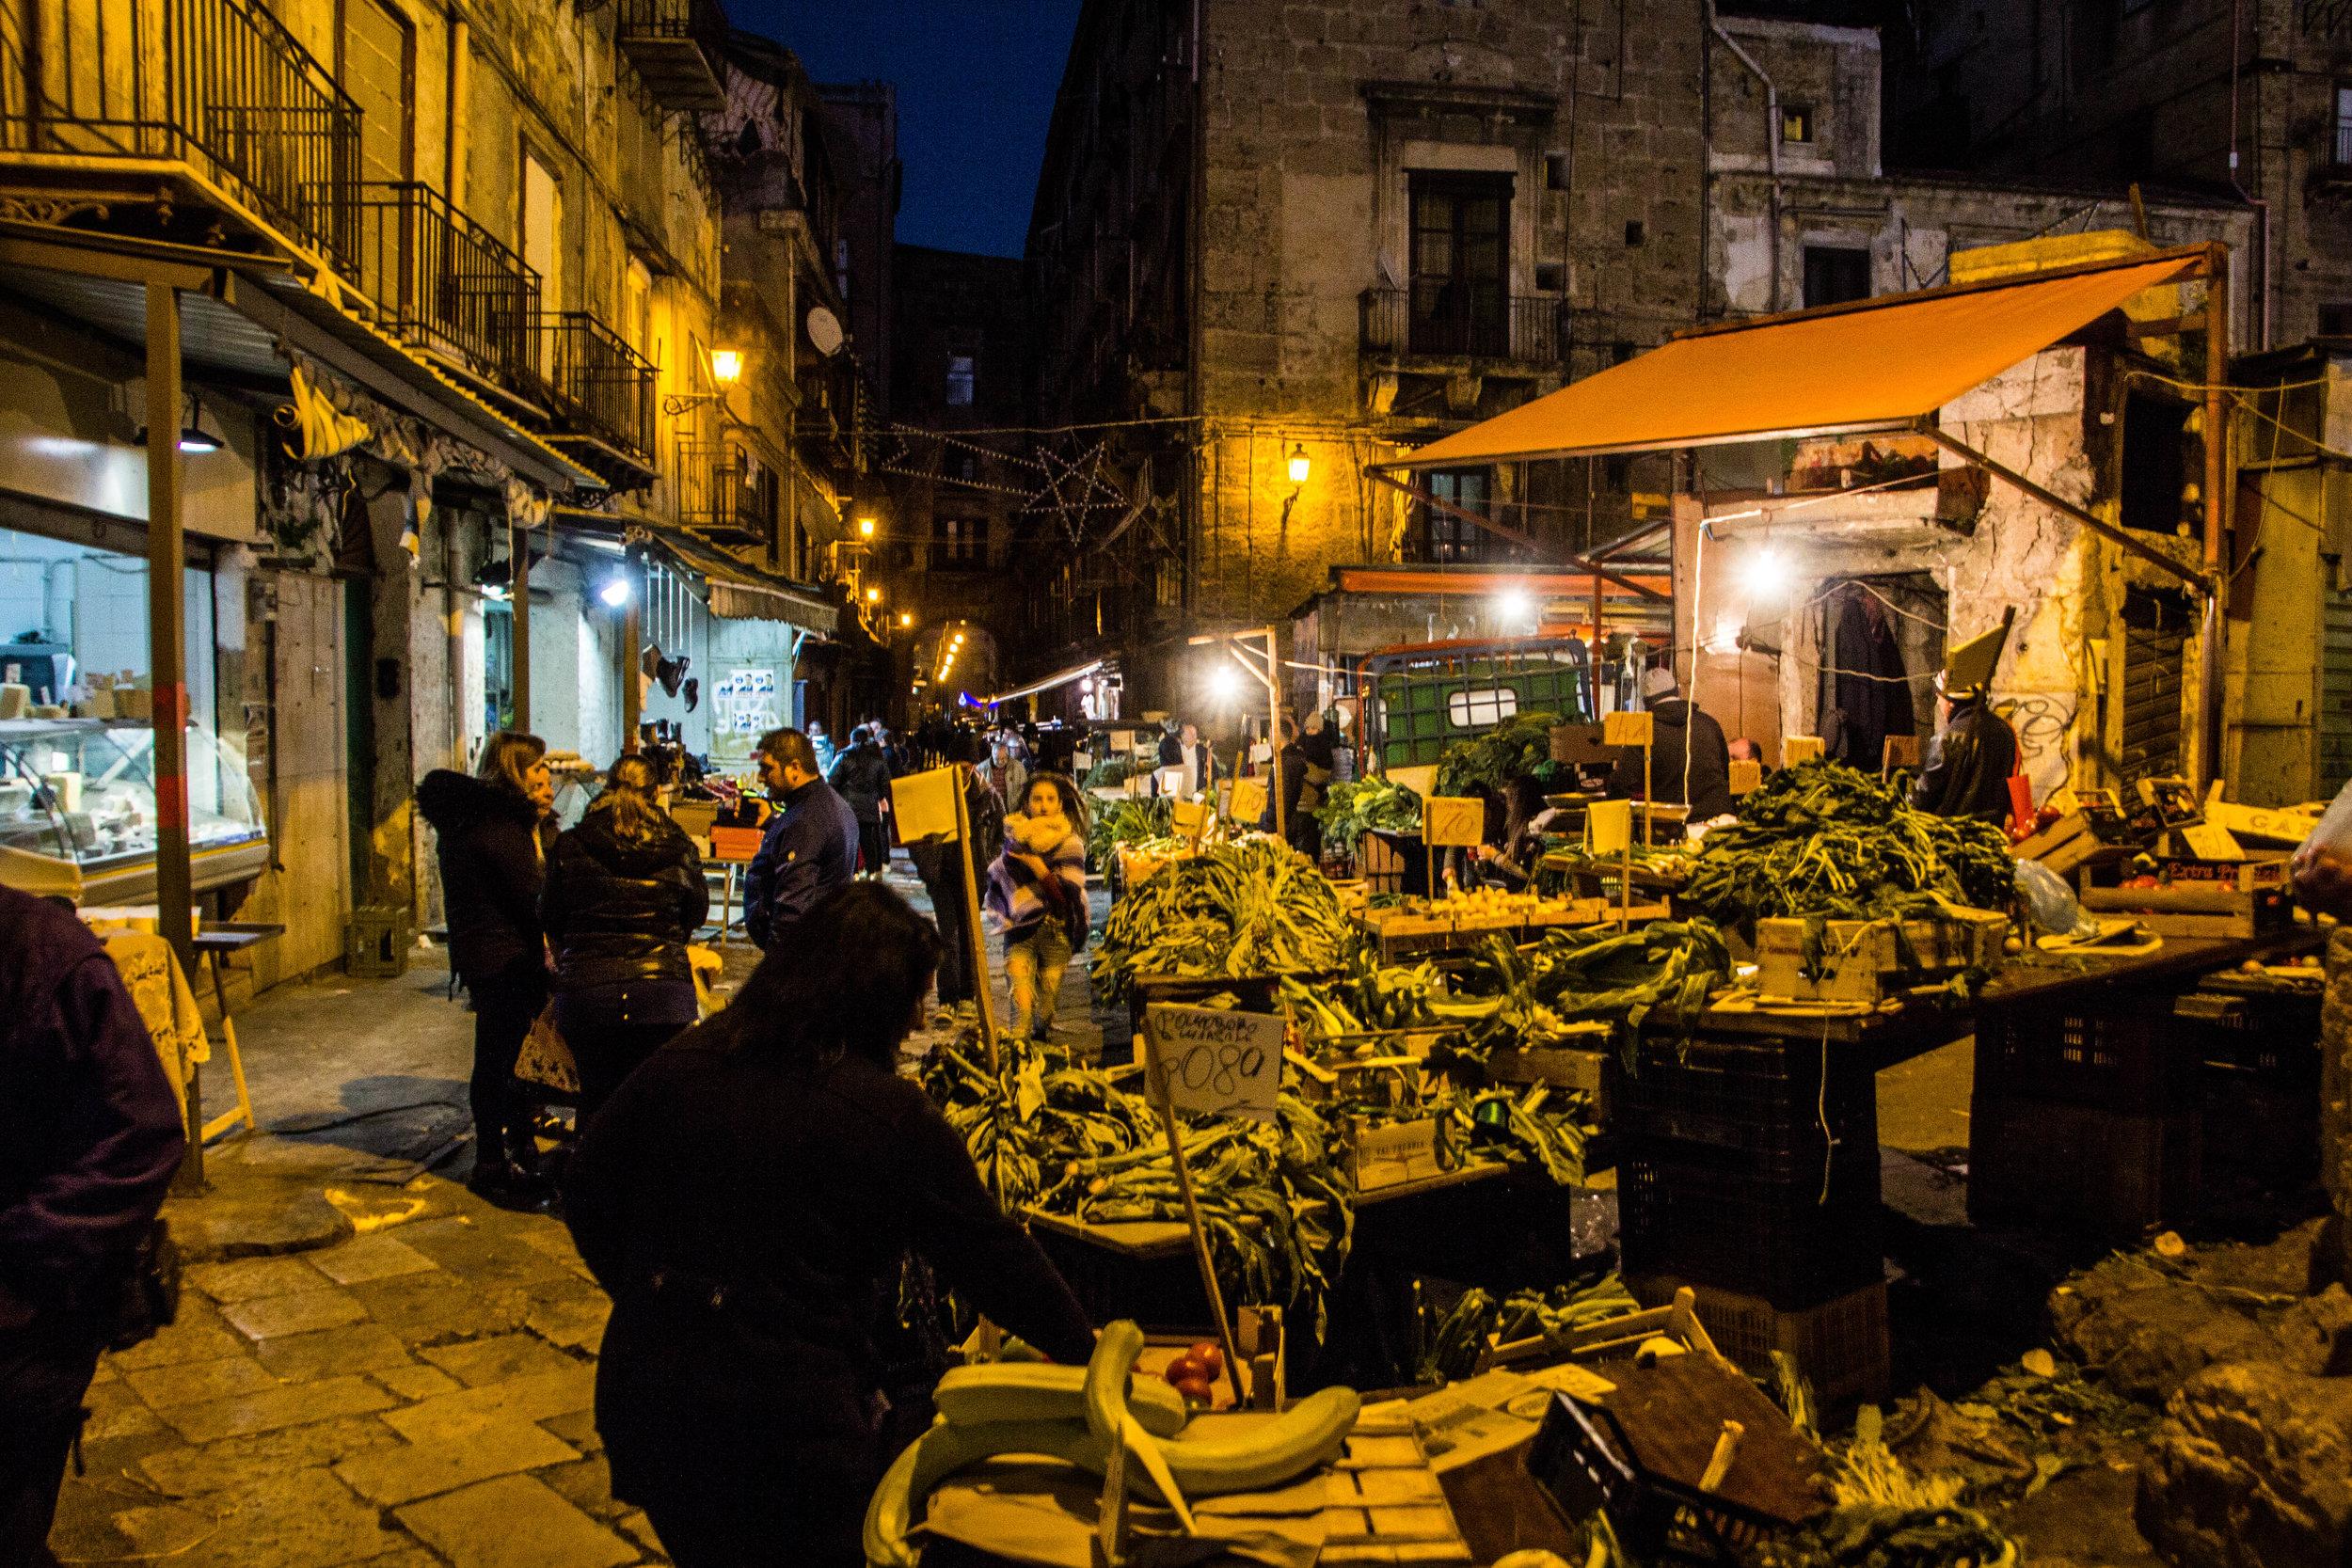 night-street-market-palermo-sicily-9.jpg